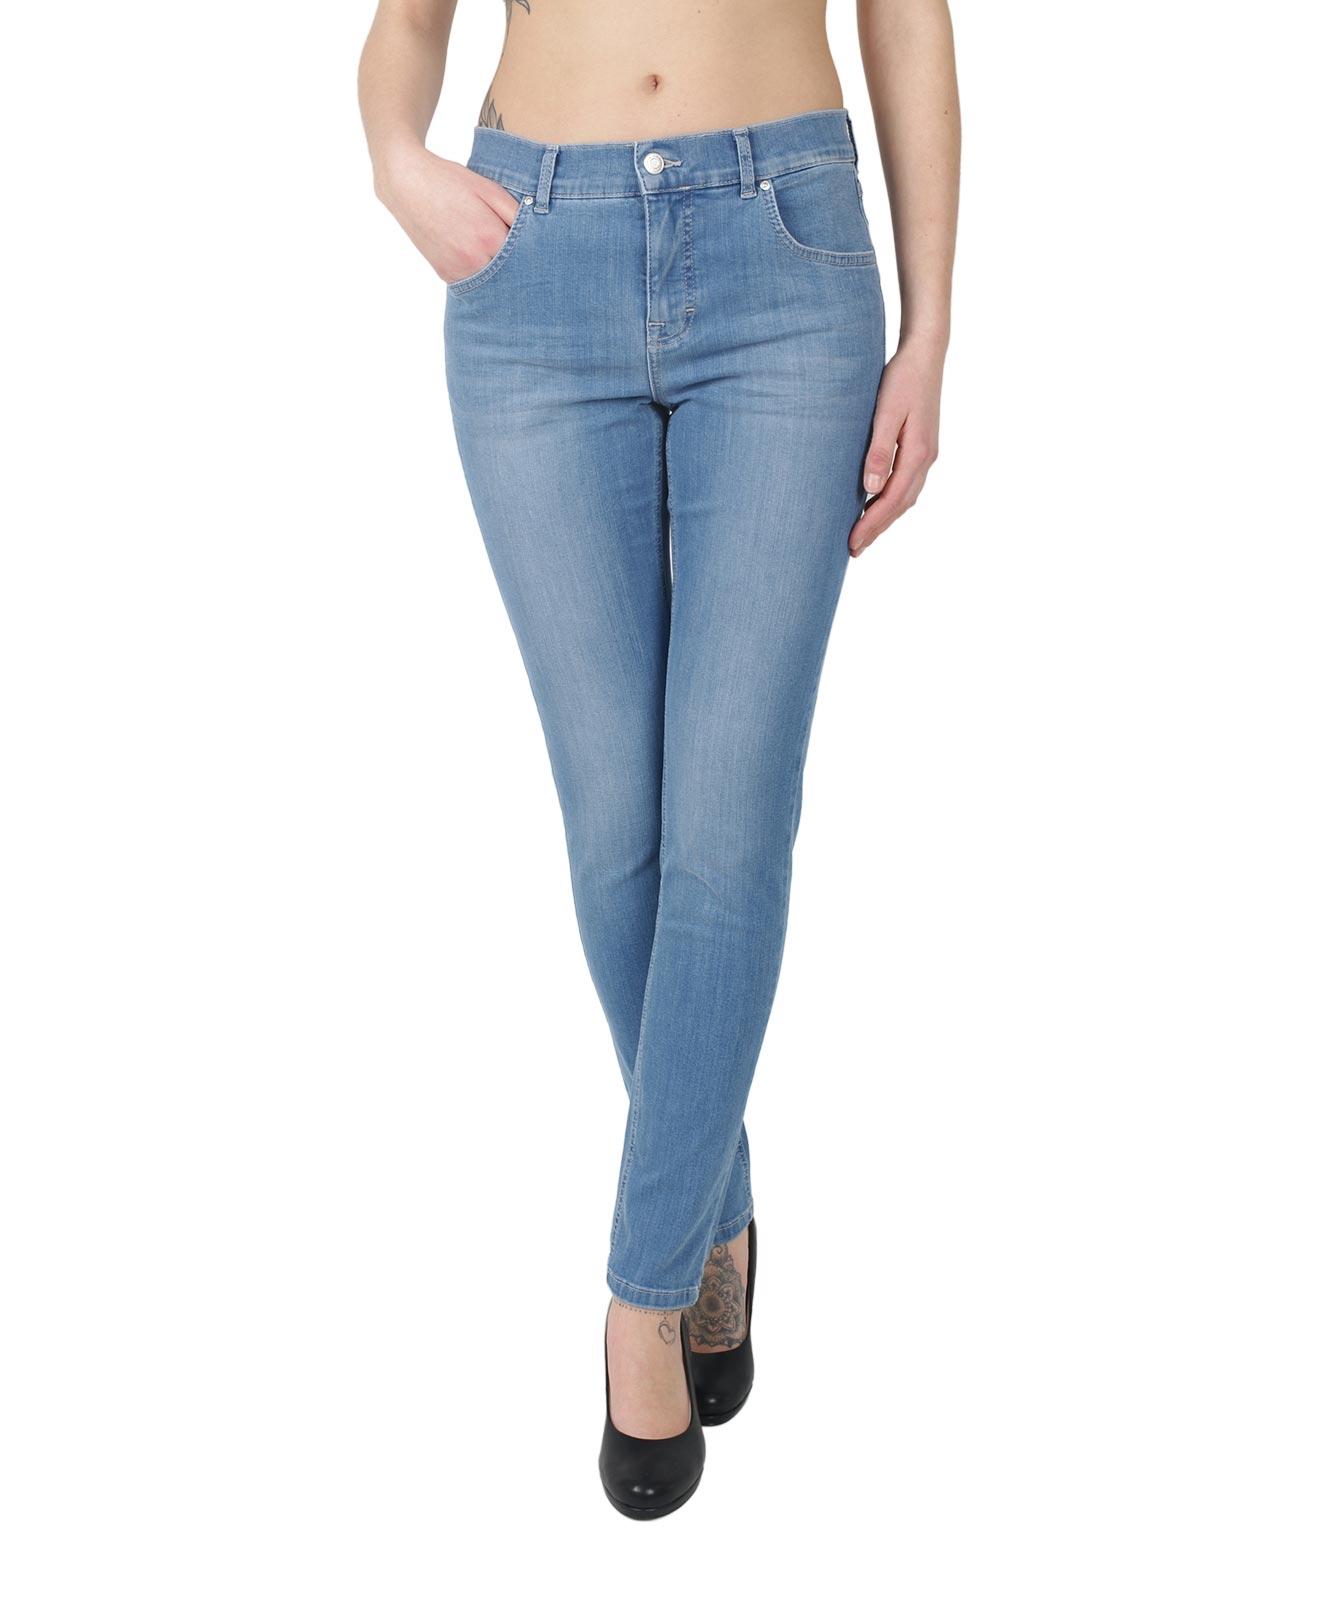 Hosen - Angels Jeans Röhre Skinny in Light Blue Used  - Onlineshop Jeans Meile